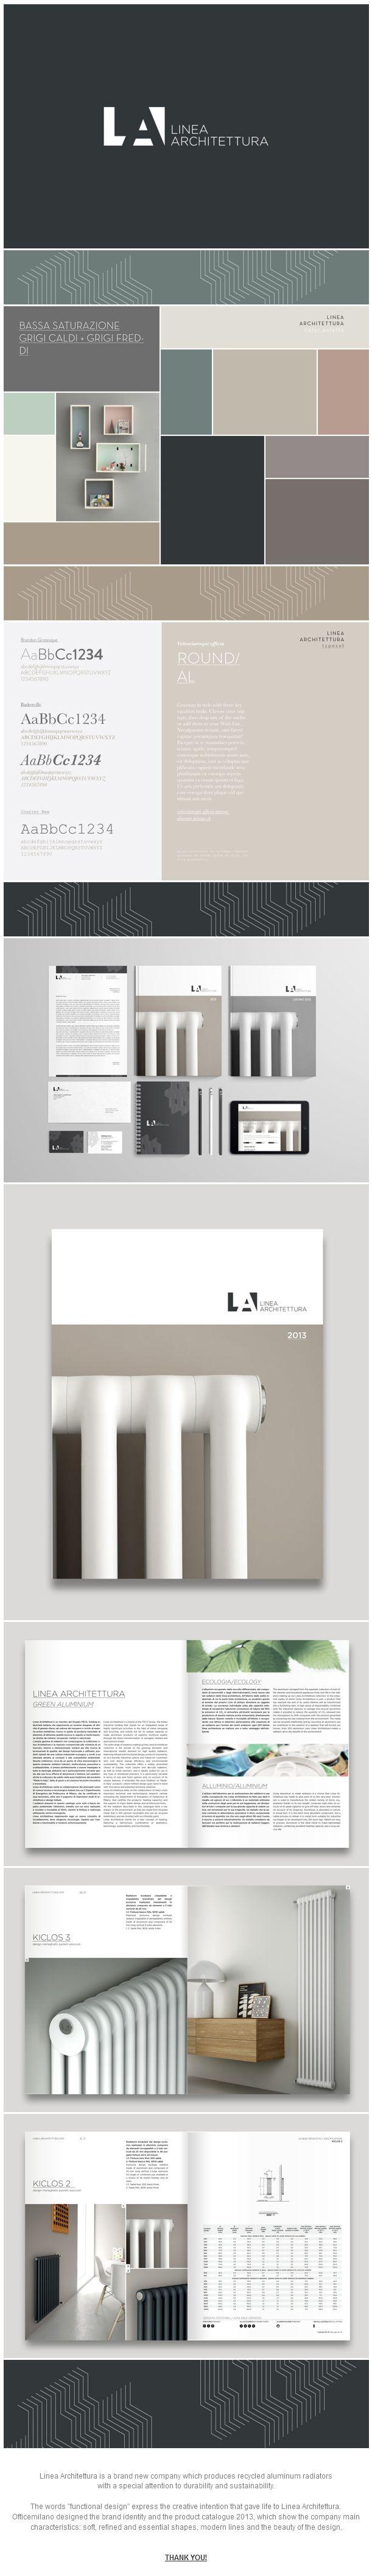 Linea Architettura | Brand Identity & Catalogue 2013 by Officemilano http://www.behance.net/officemilano